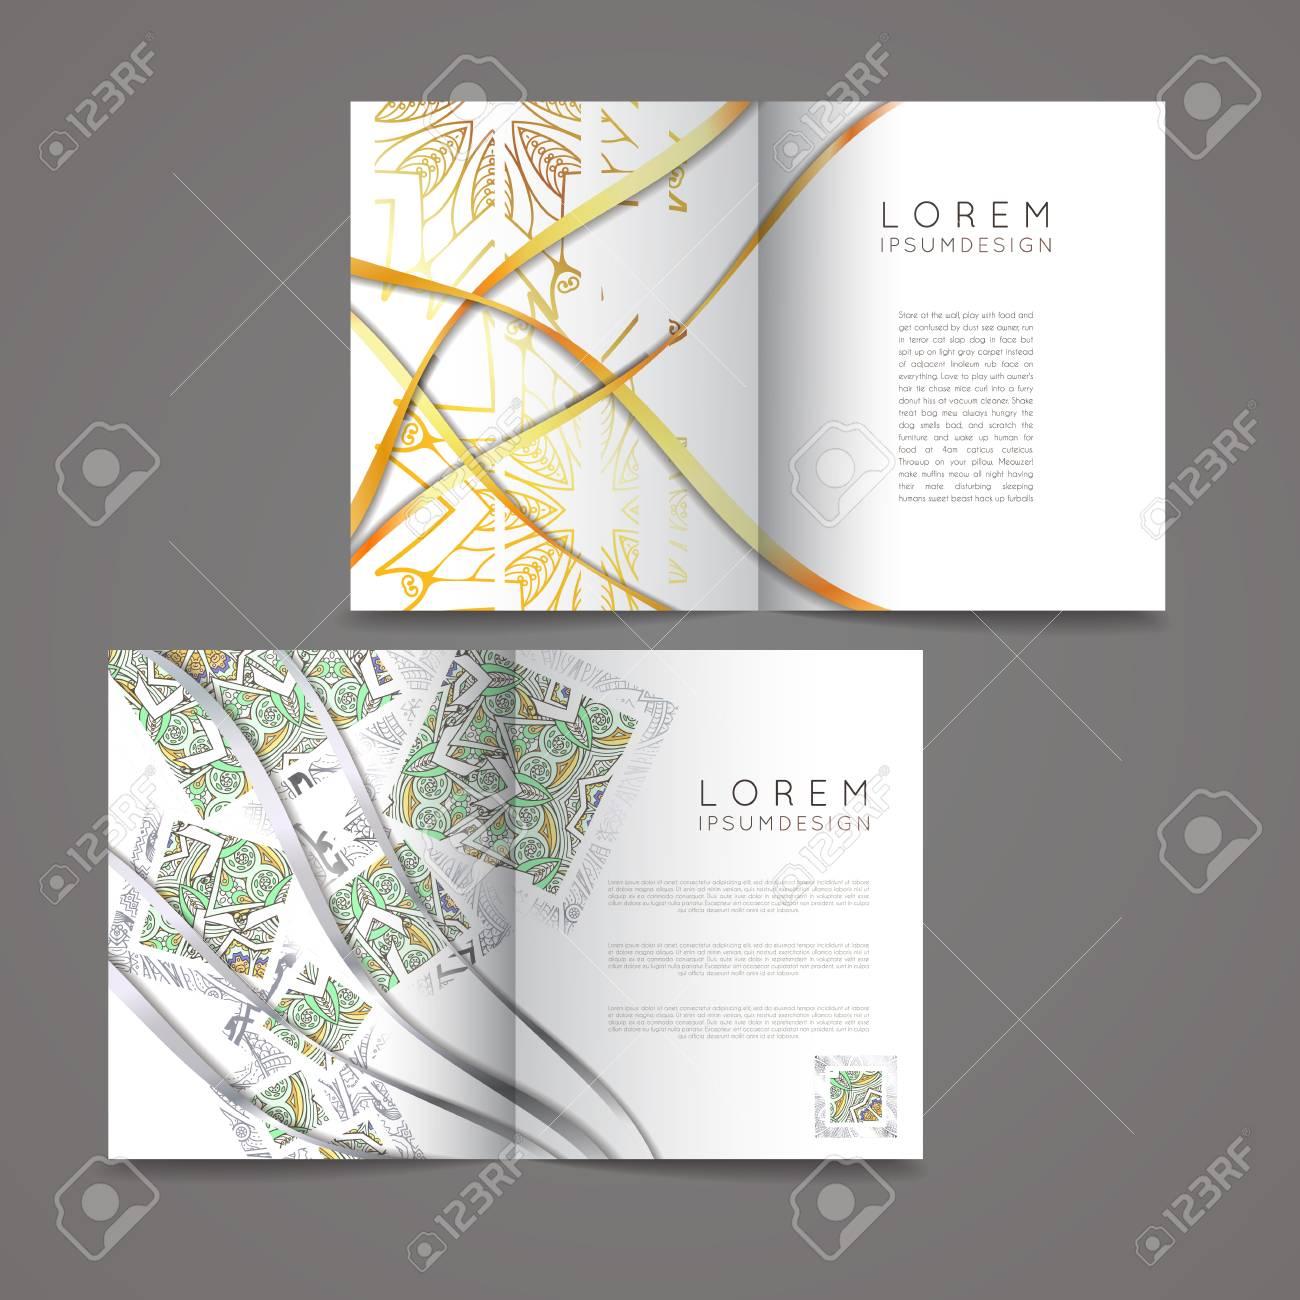 Collection De Design Avec Des Symboles Mandala Jeu Cartes